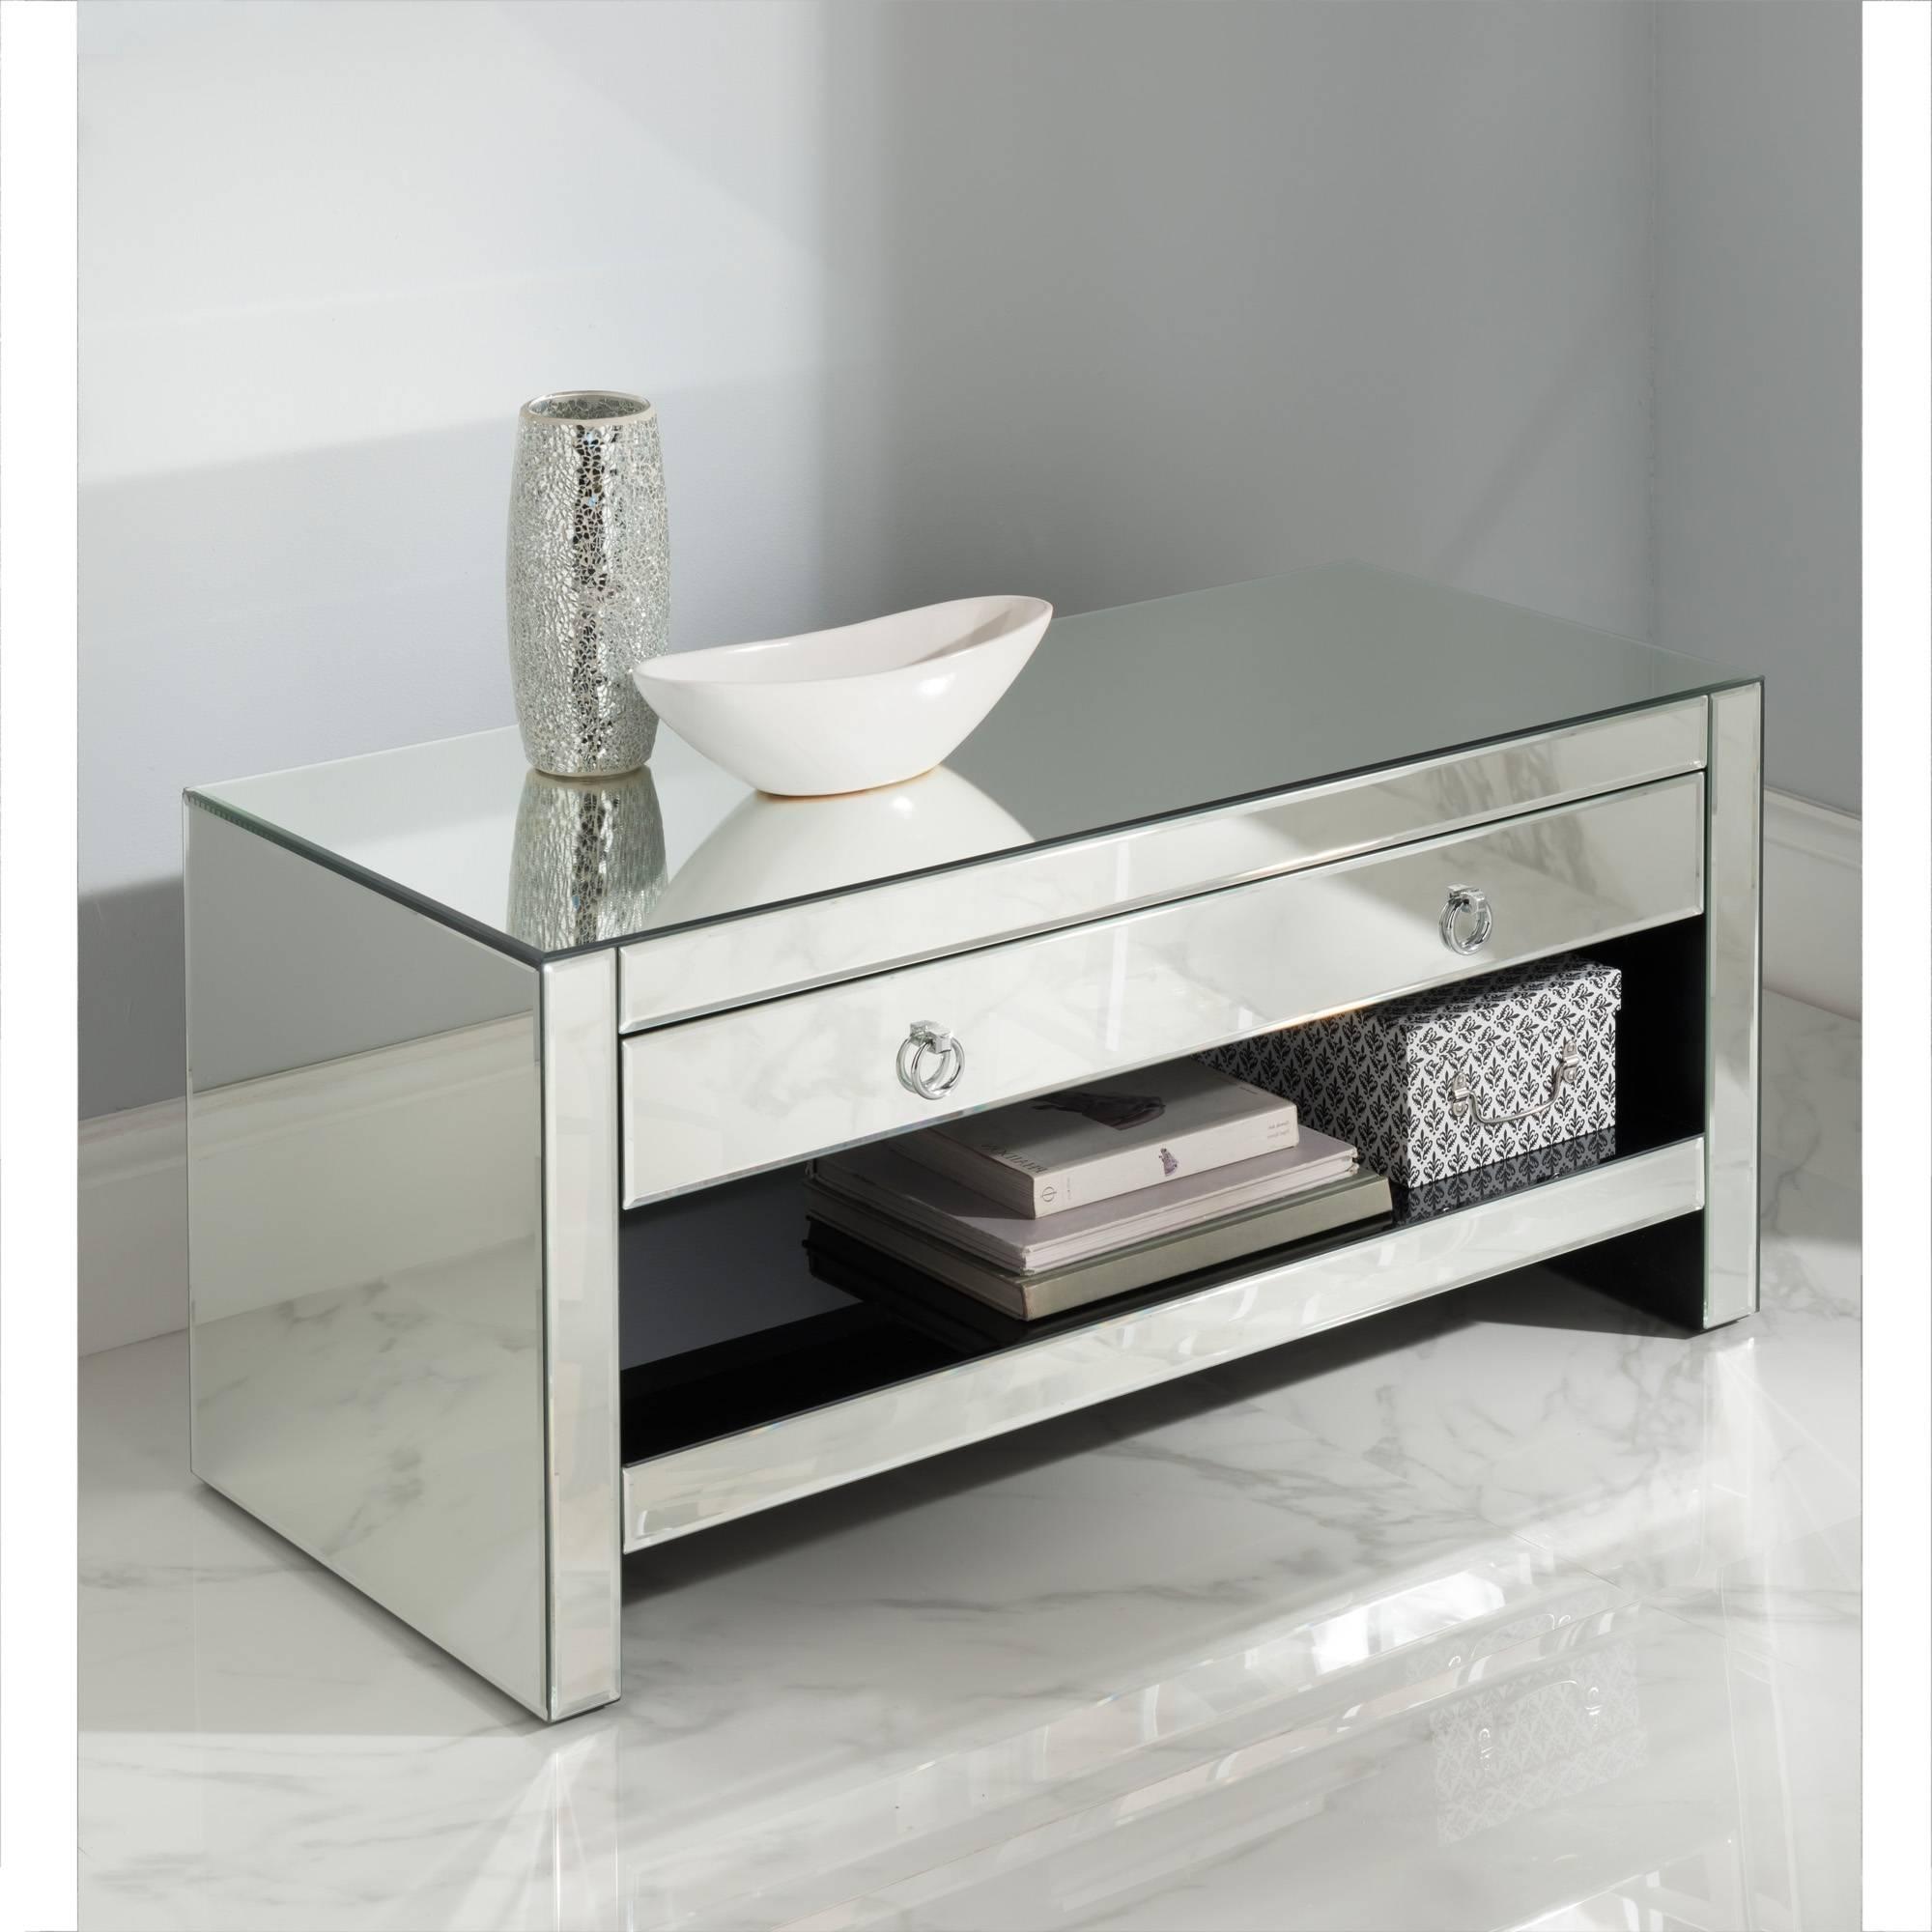 Mirrored Tv Cabinet | Glass Venetian Furniture | Homesdirect365 inside Mirrored Tv Cabinets (Image 5 of 15)